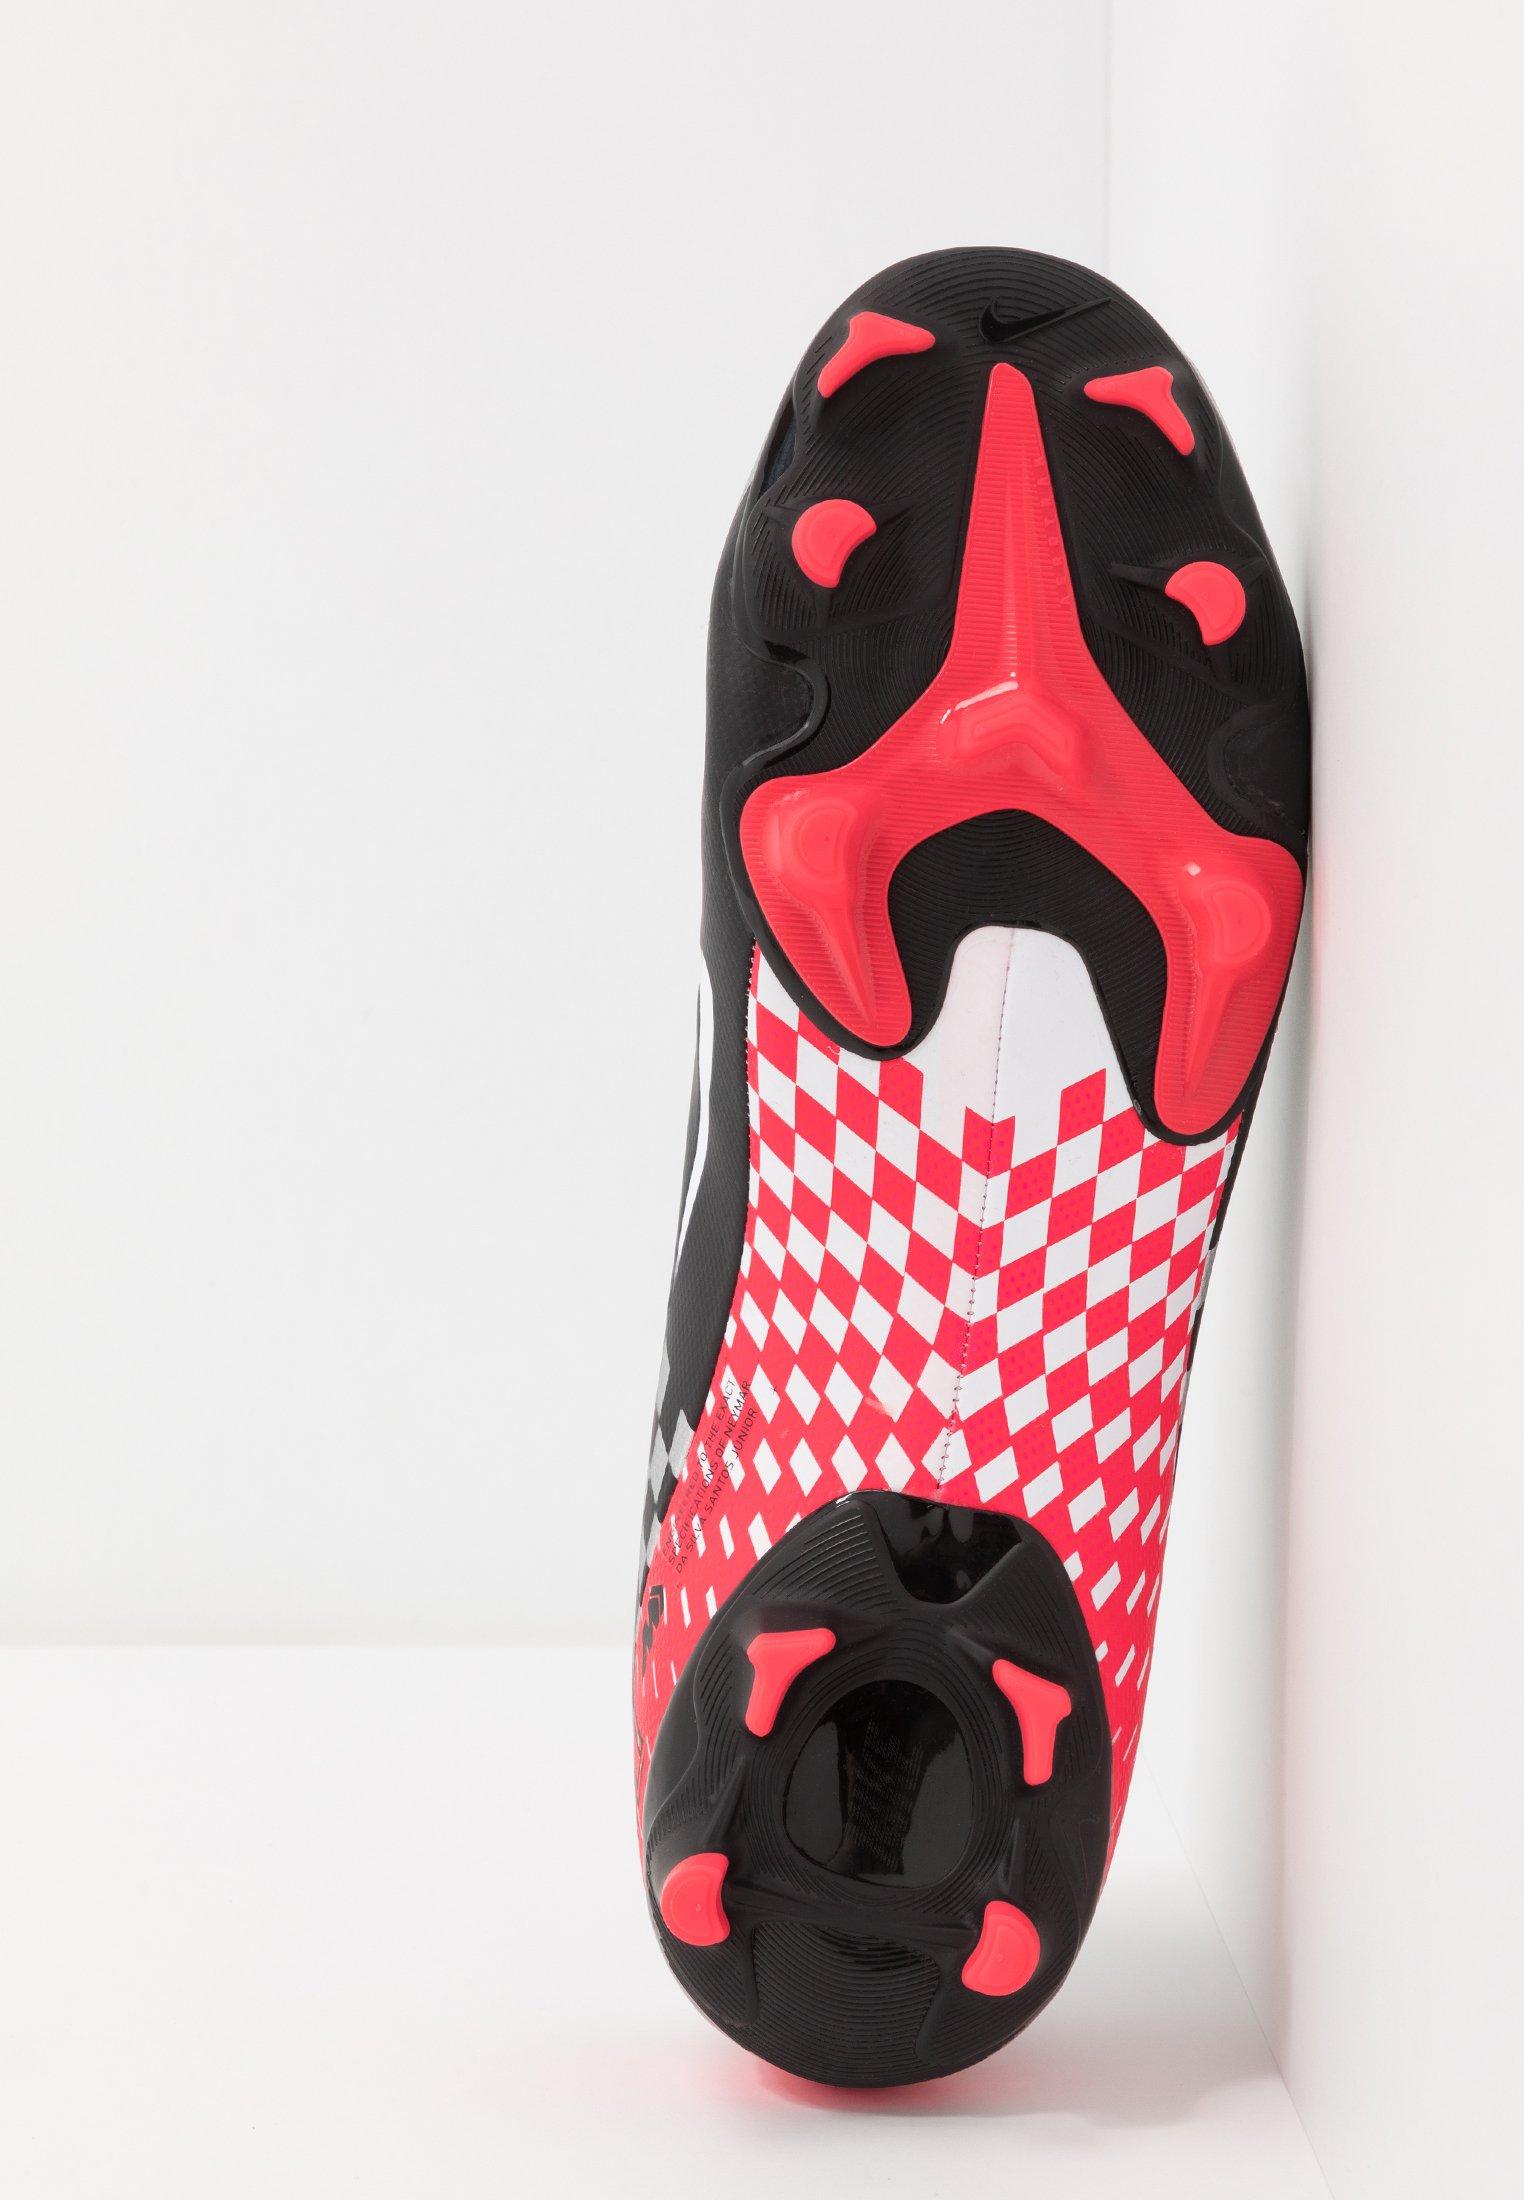 Nike Performance VAPOR 13 ACADEMY NEYMAR FG/MG - Fußballschuh Nocken - chrome/black/red orbit/platinum tint/white/dunkelgrau - Herrenschuhe ERHK6